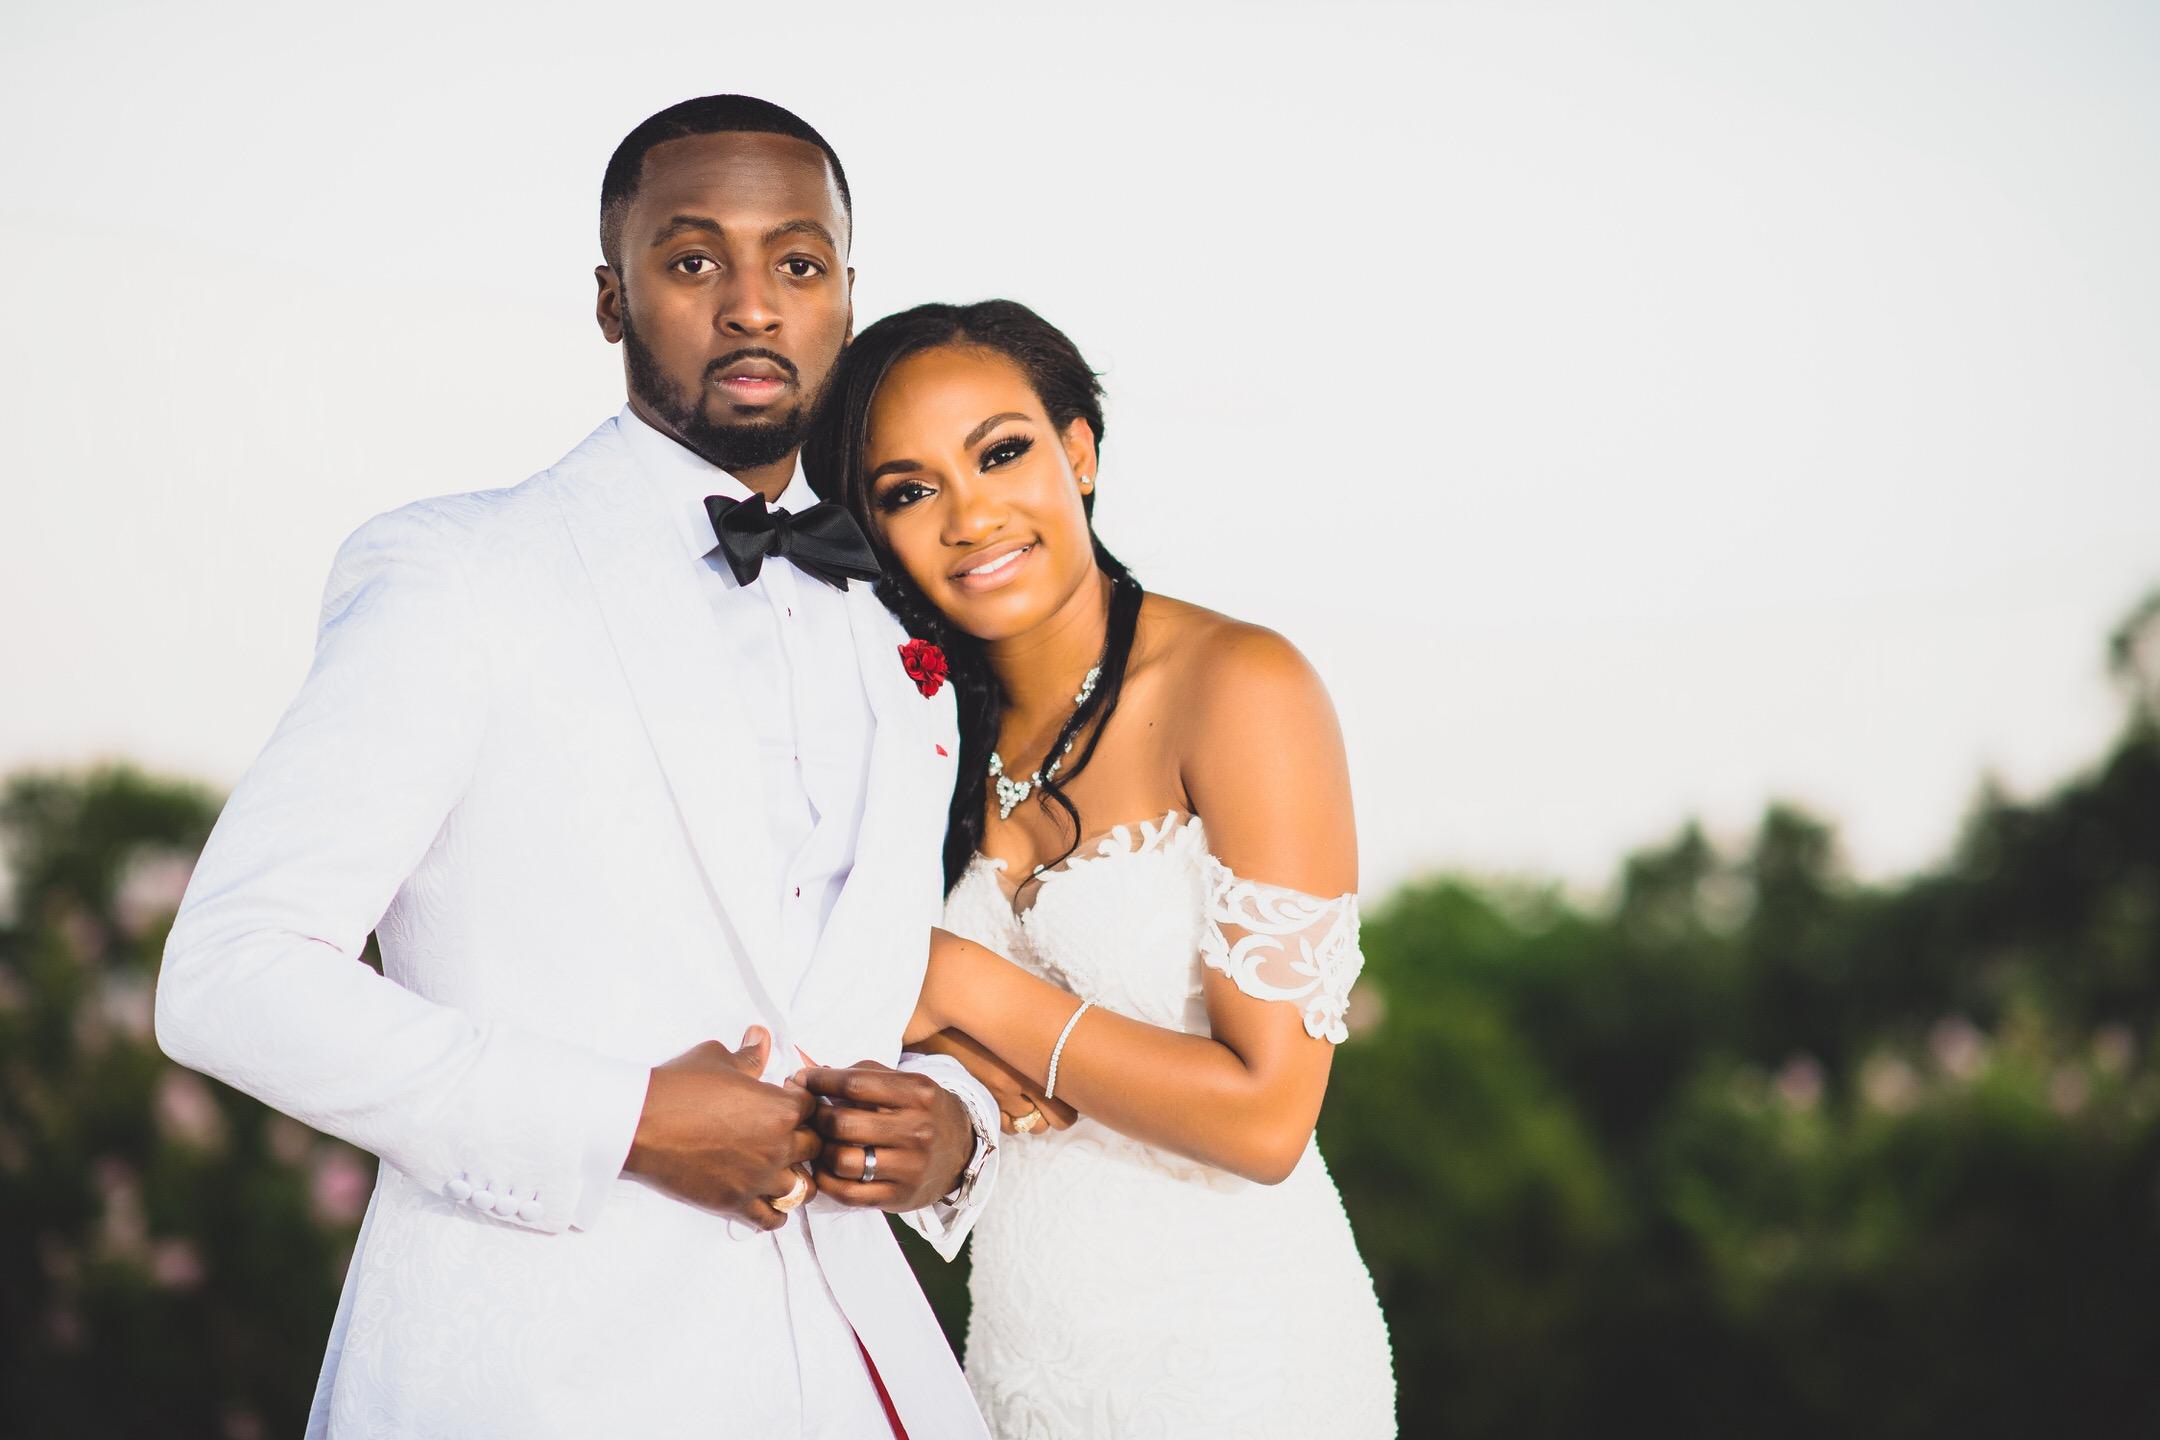 Leon-Contreras-Houston-Texas-Aggie-Wedding-Graduation-Engagement-Portrait-Photographer-30501.jpg